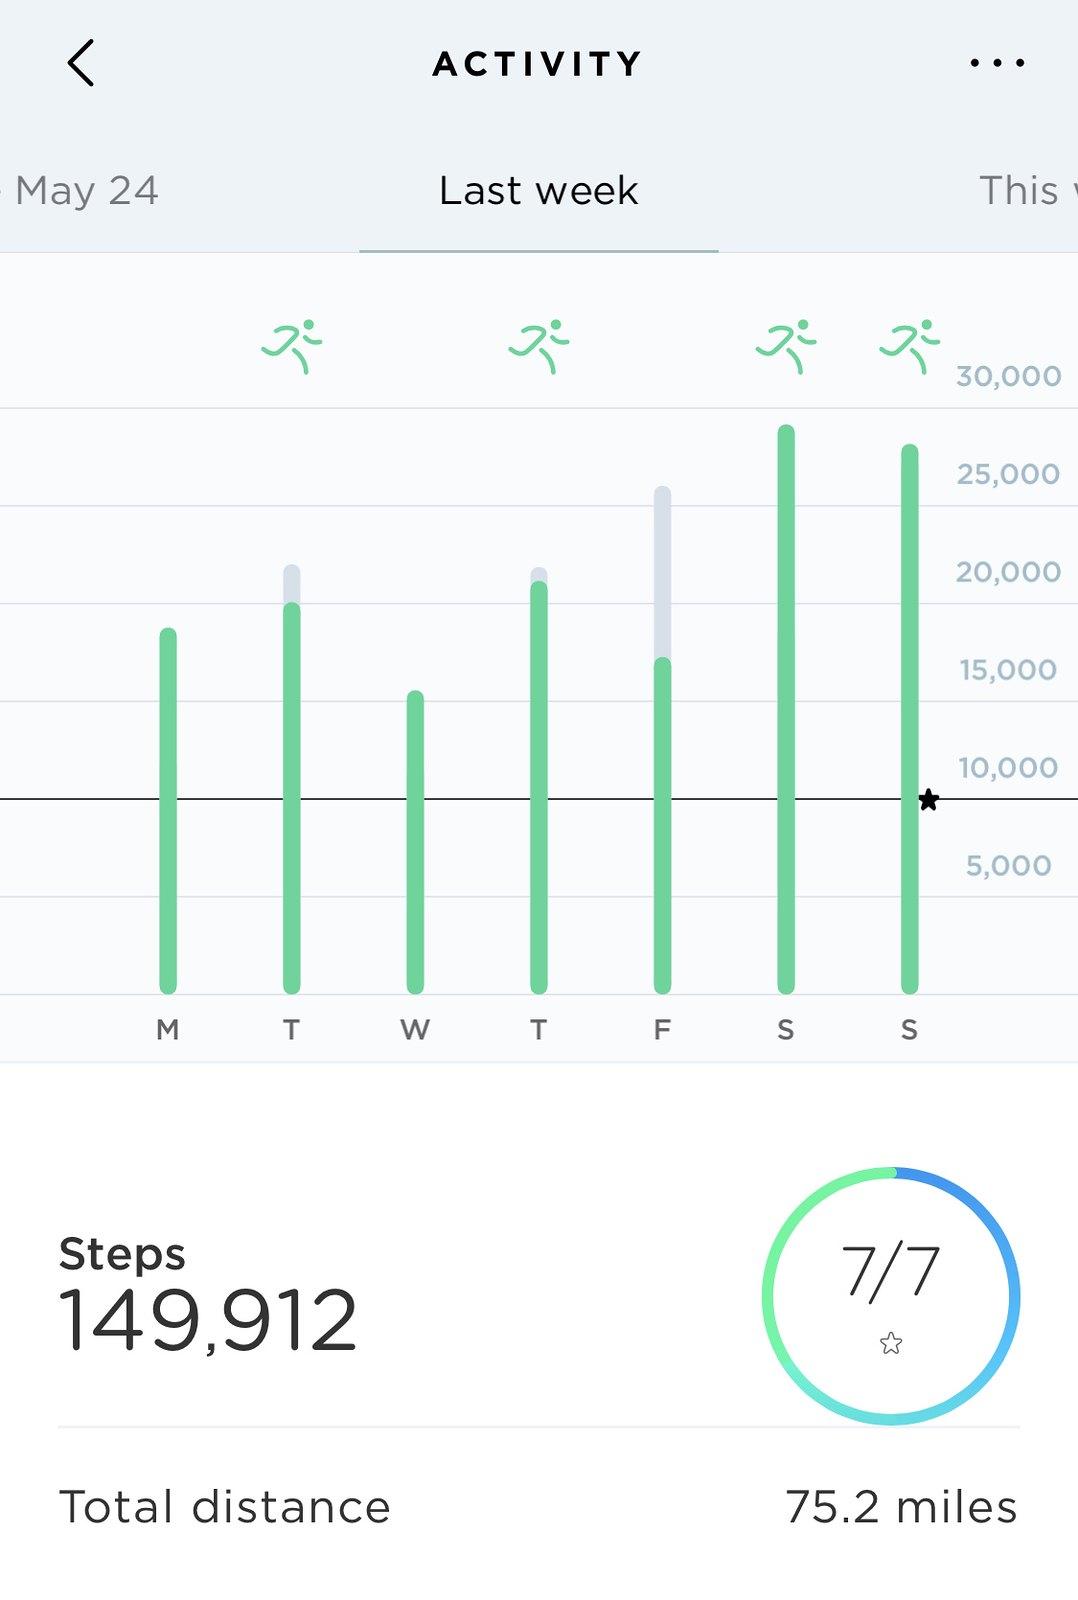 149,912 steps